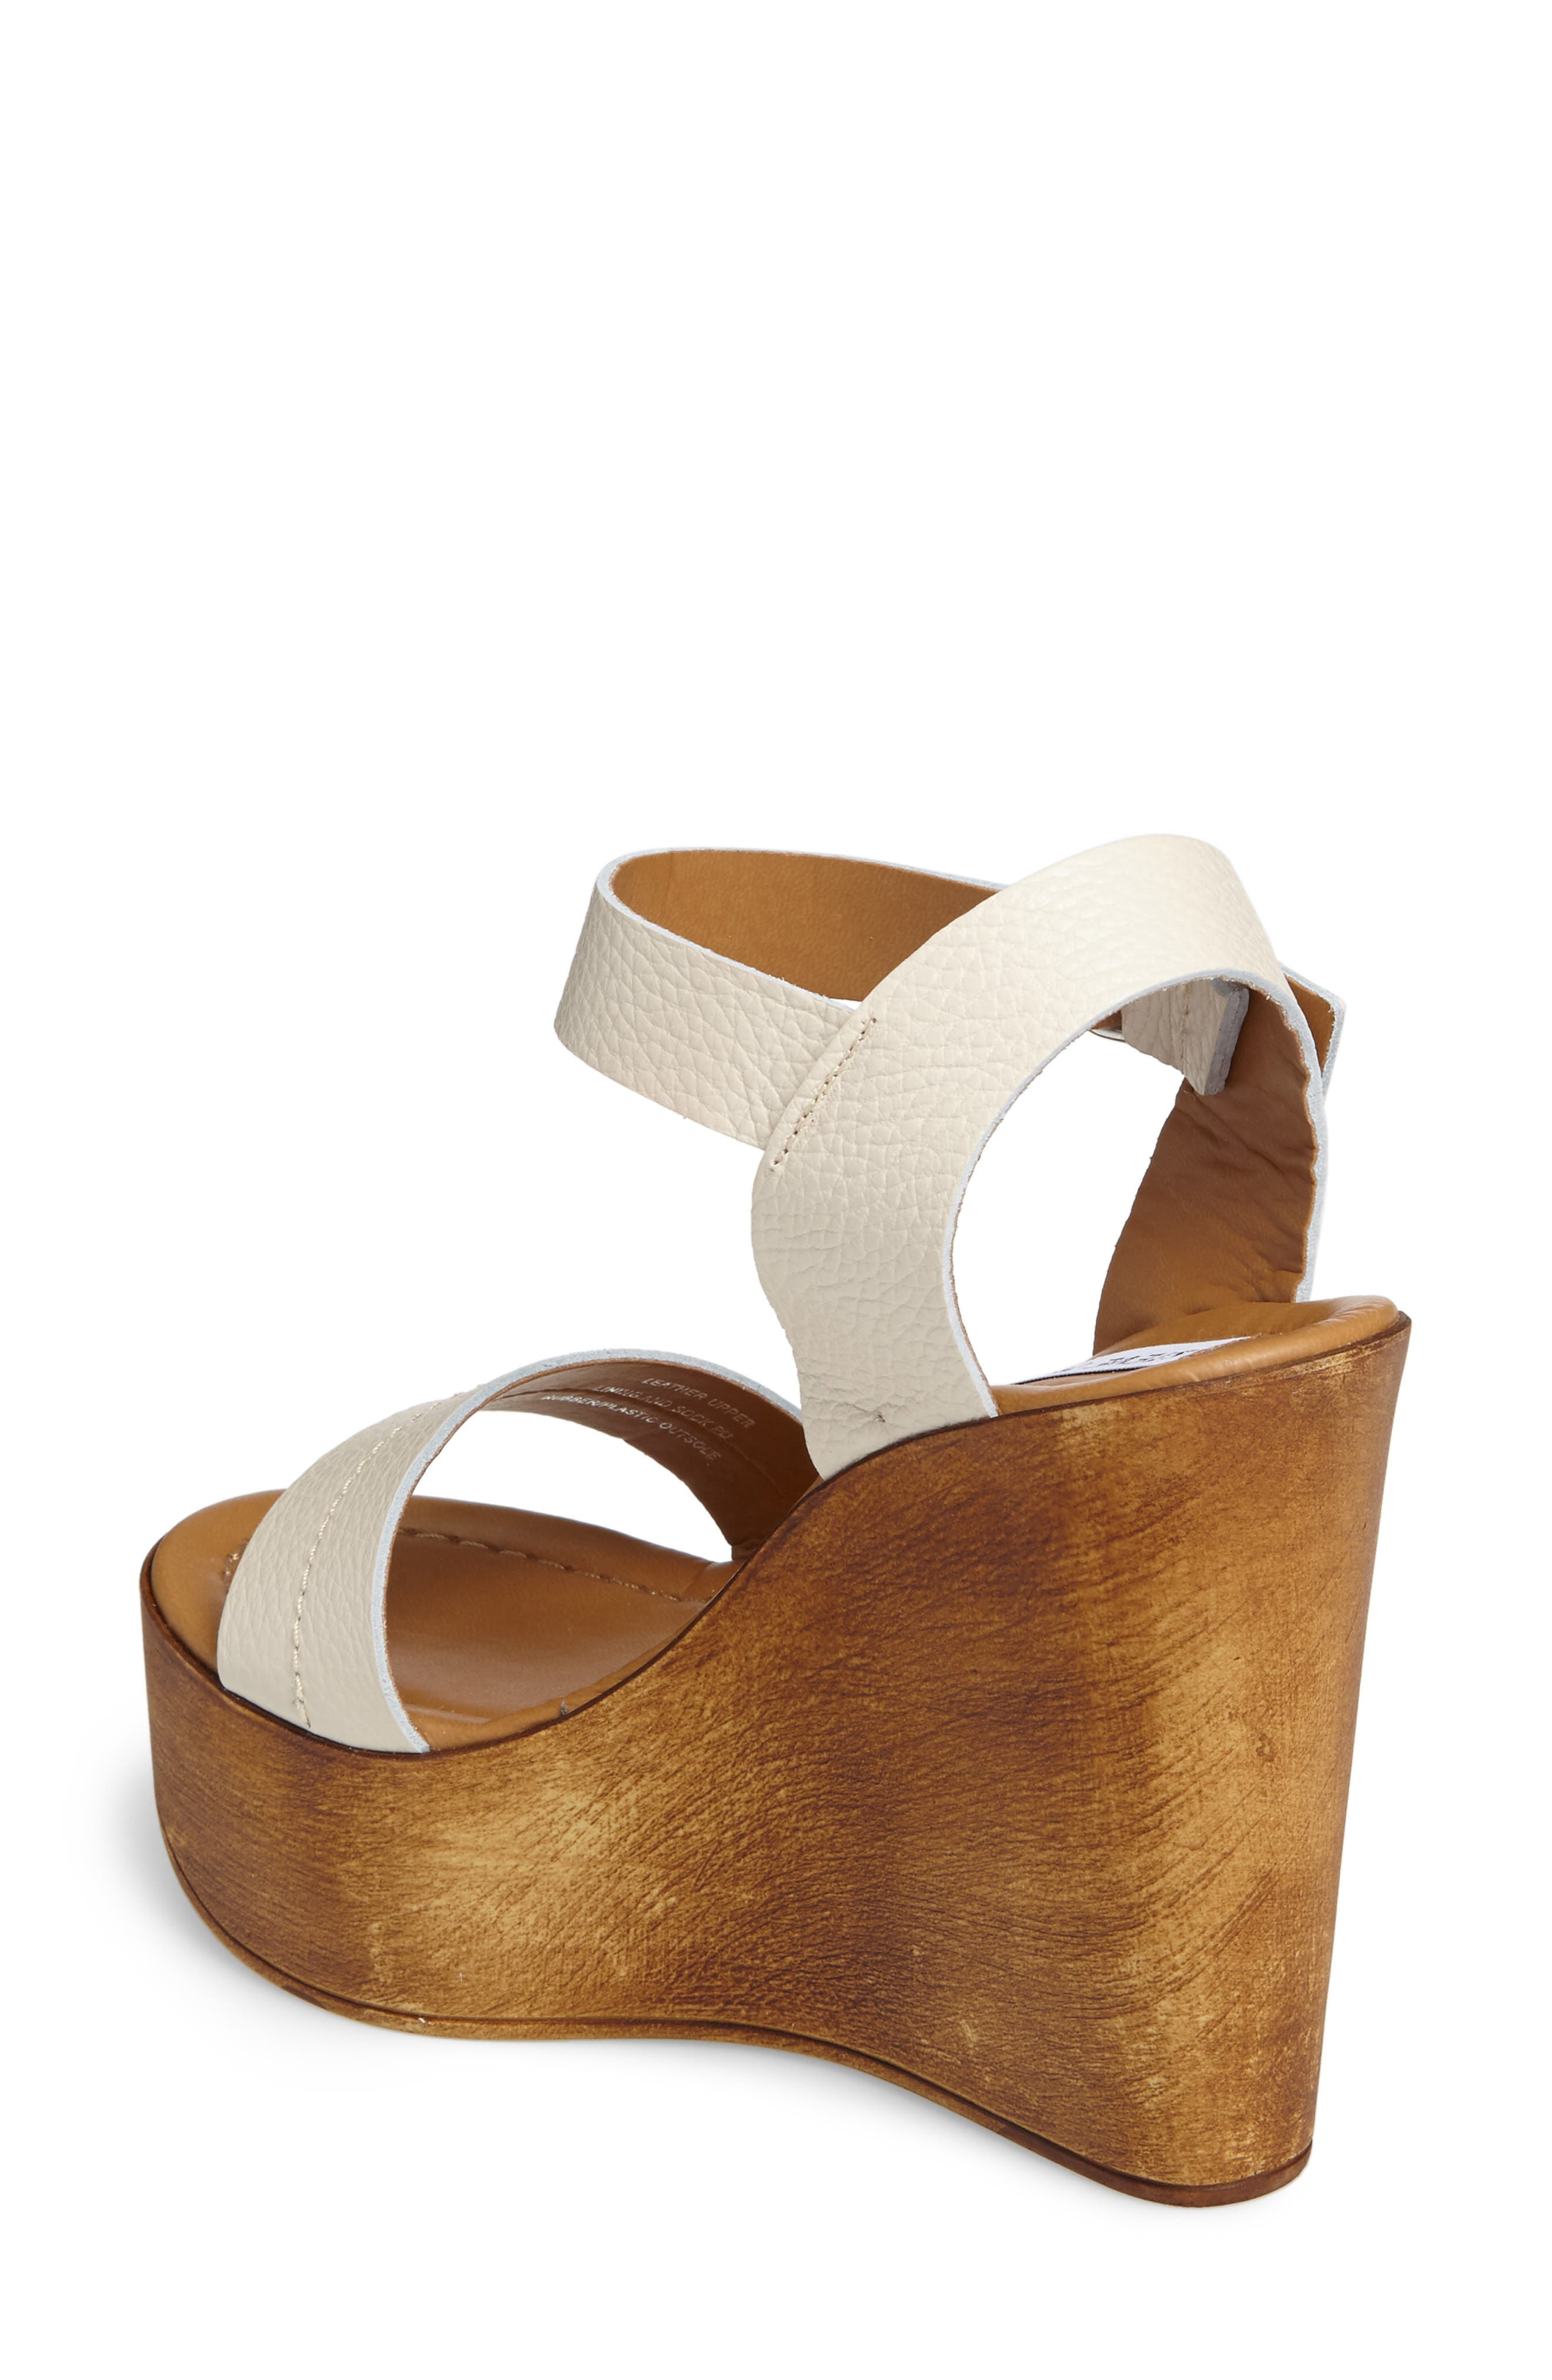 Belma Wedge Sandal,                             Alternate thumbnail 5, color,